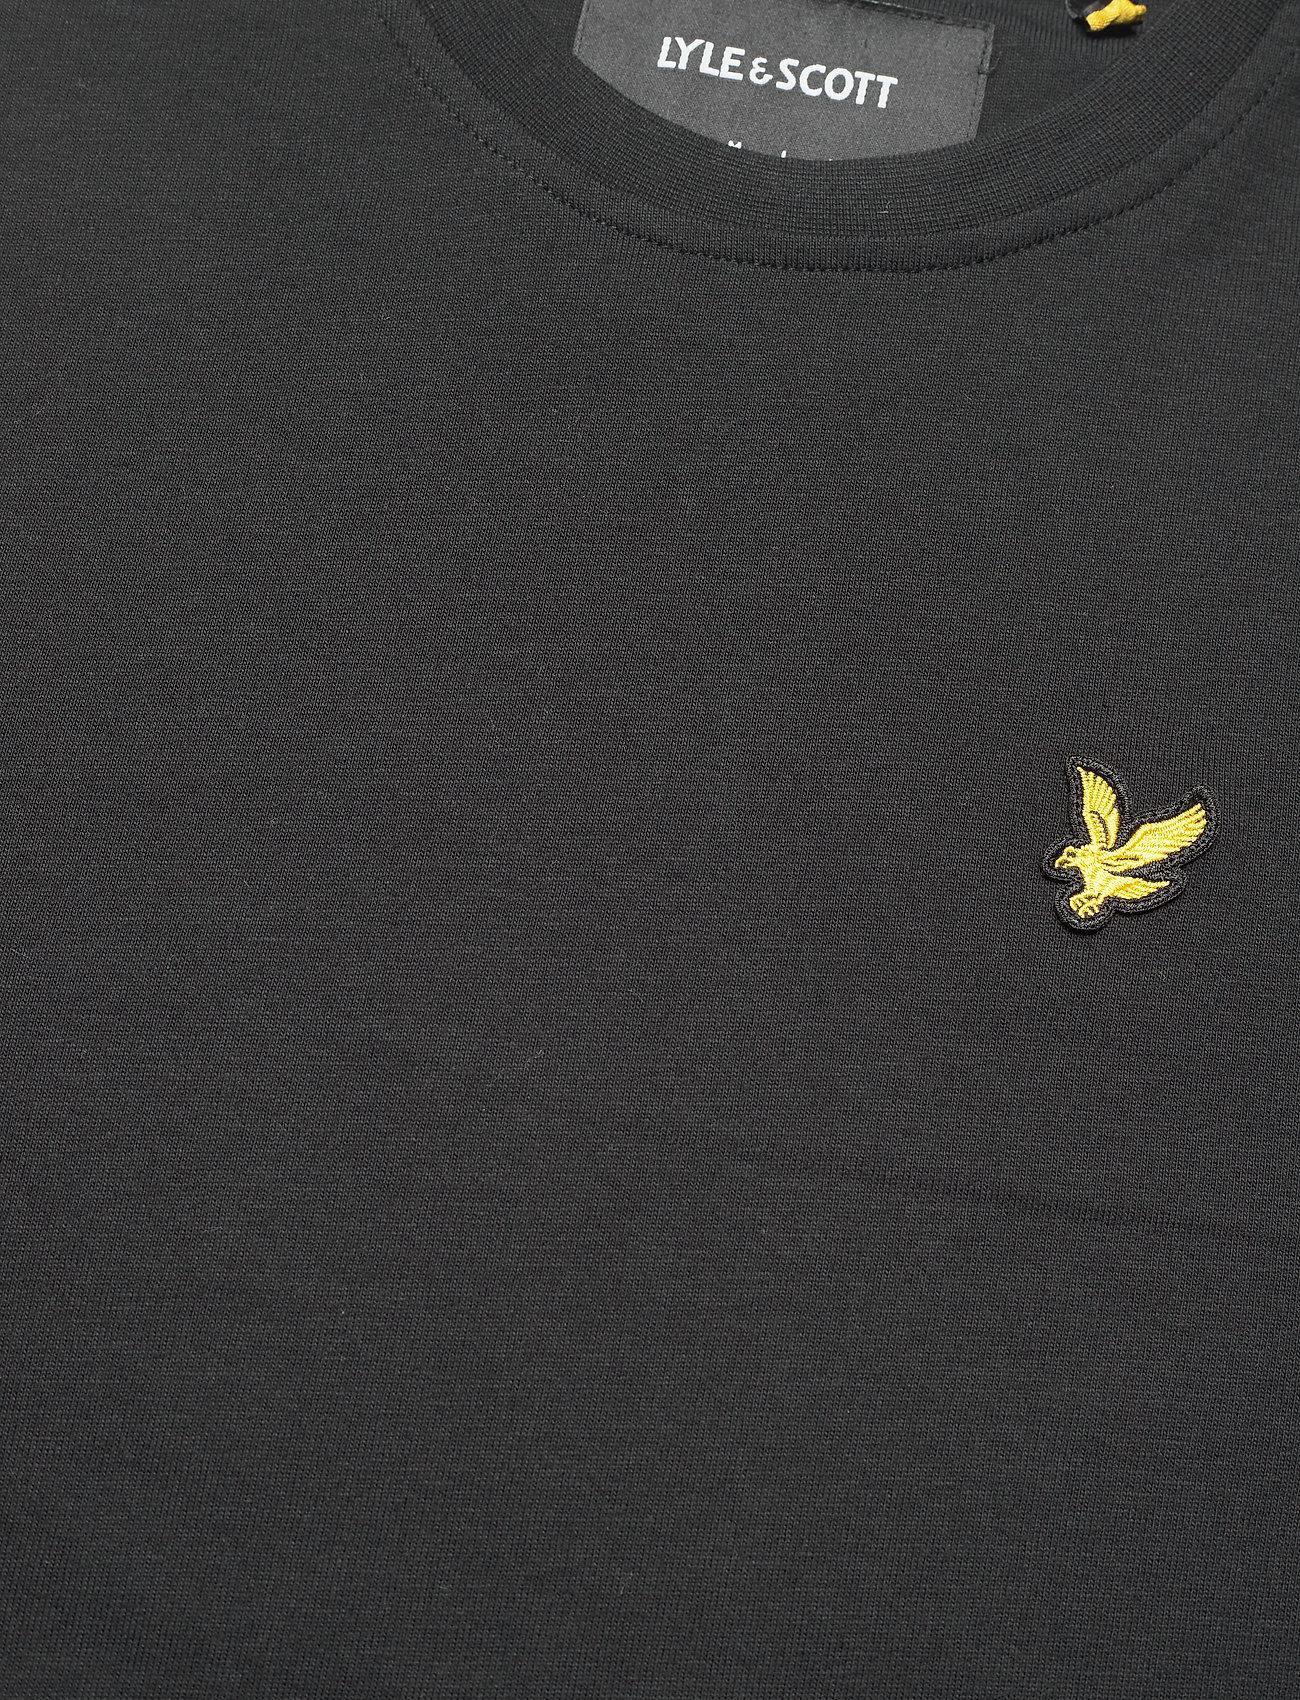 Cropped T-shirt (Jet Black) (25 €) - Lyle & Scott JfQl7